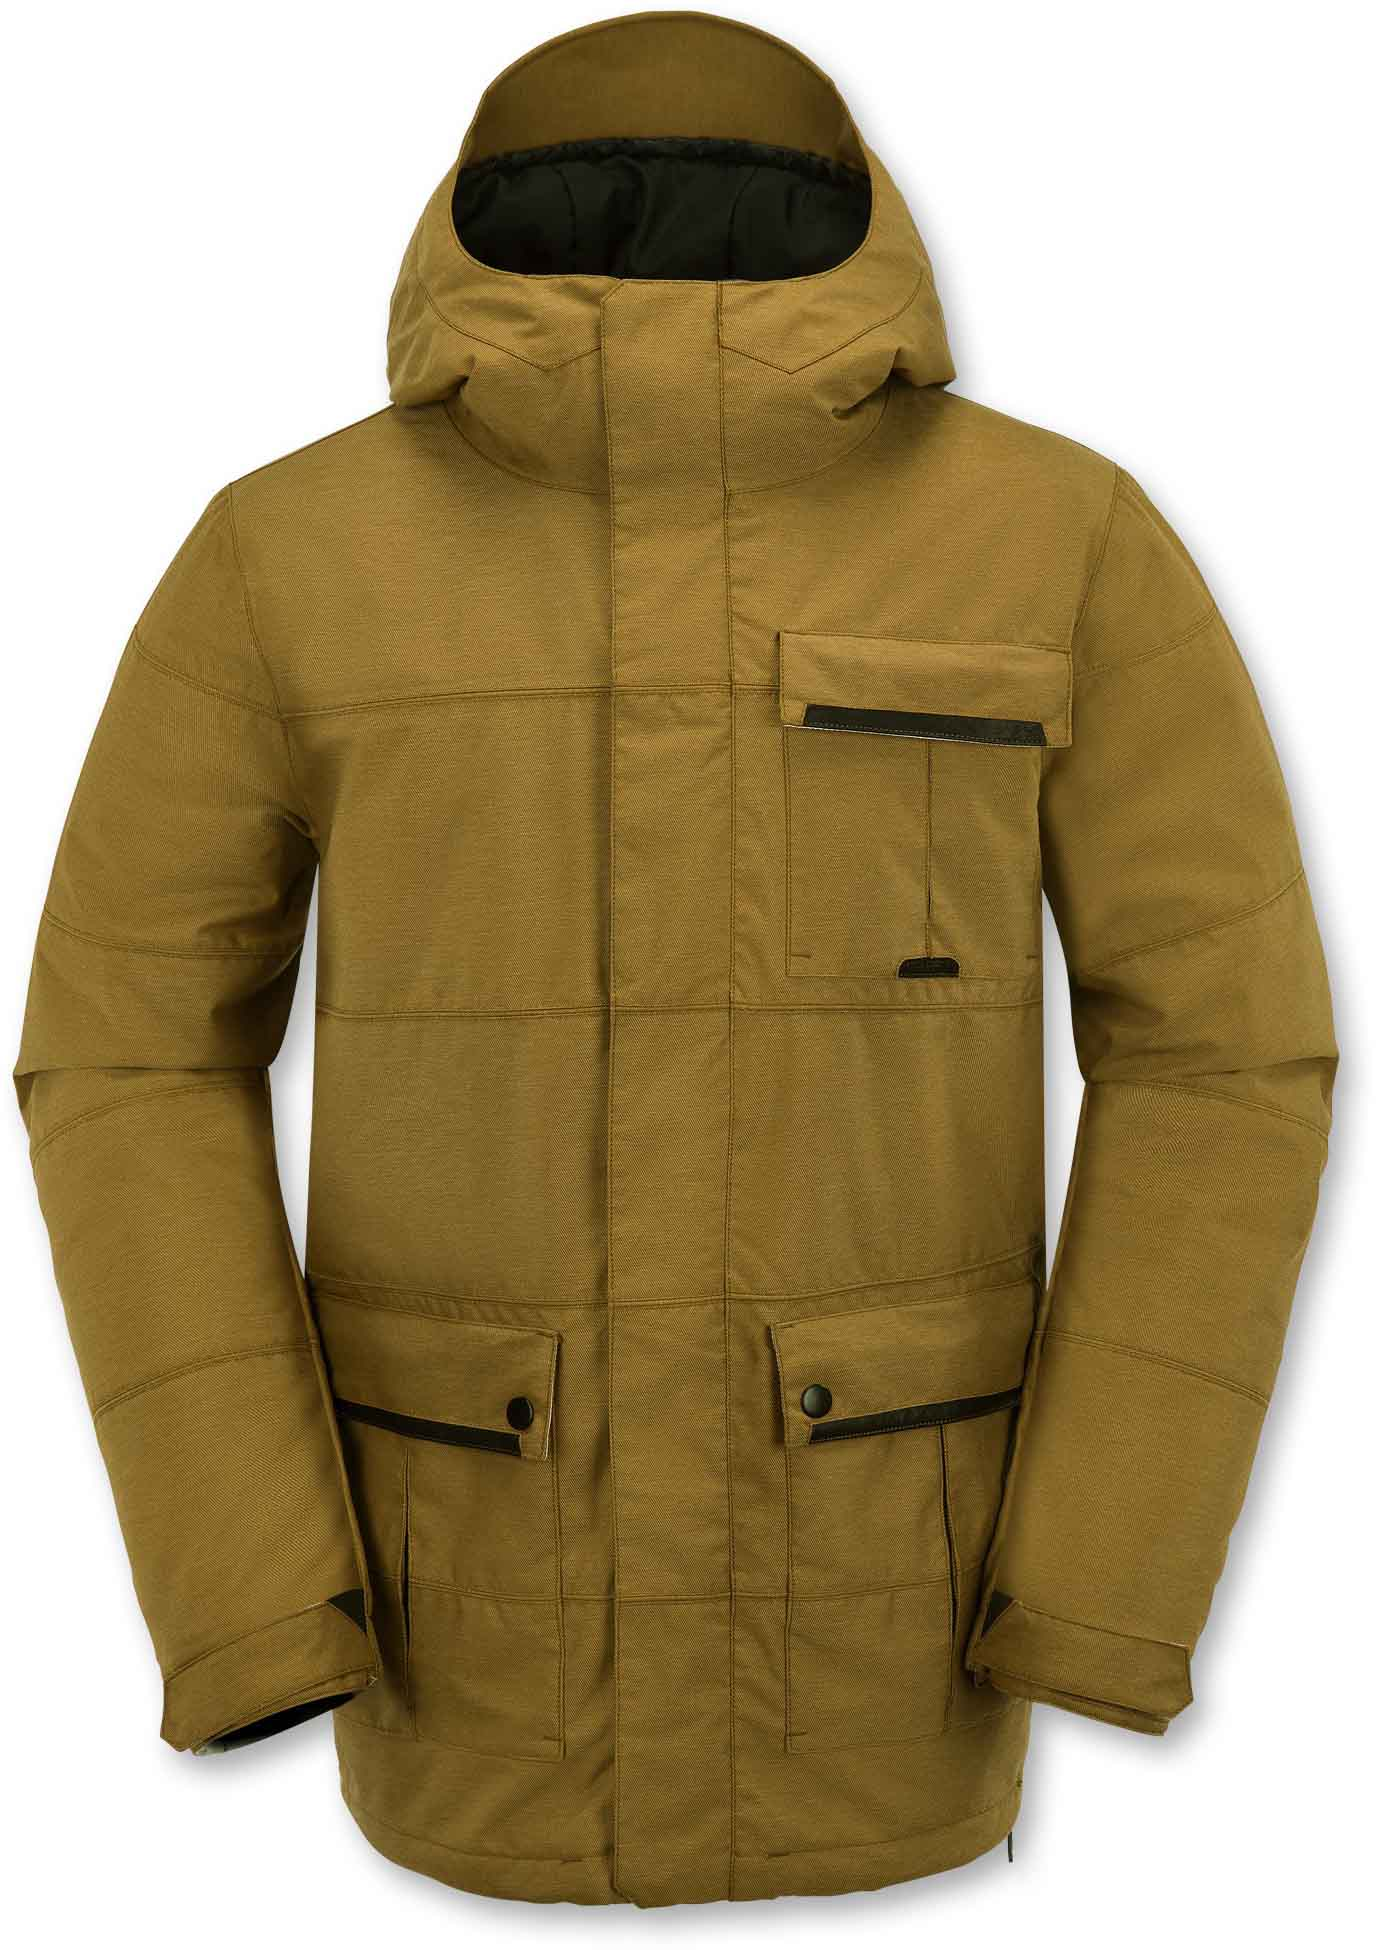 image volcom-captain-insulated-jacket-caramel-jpg